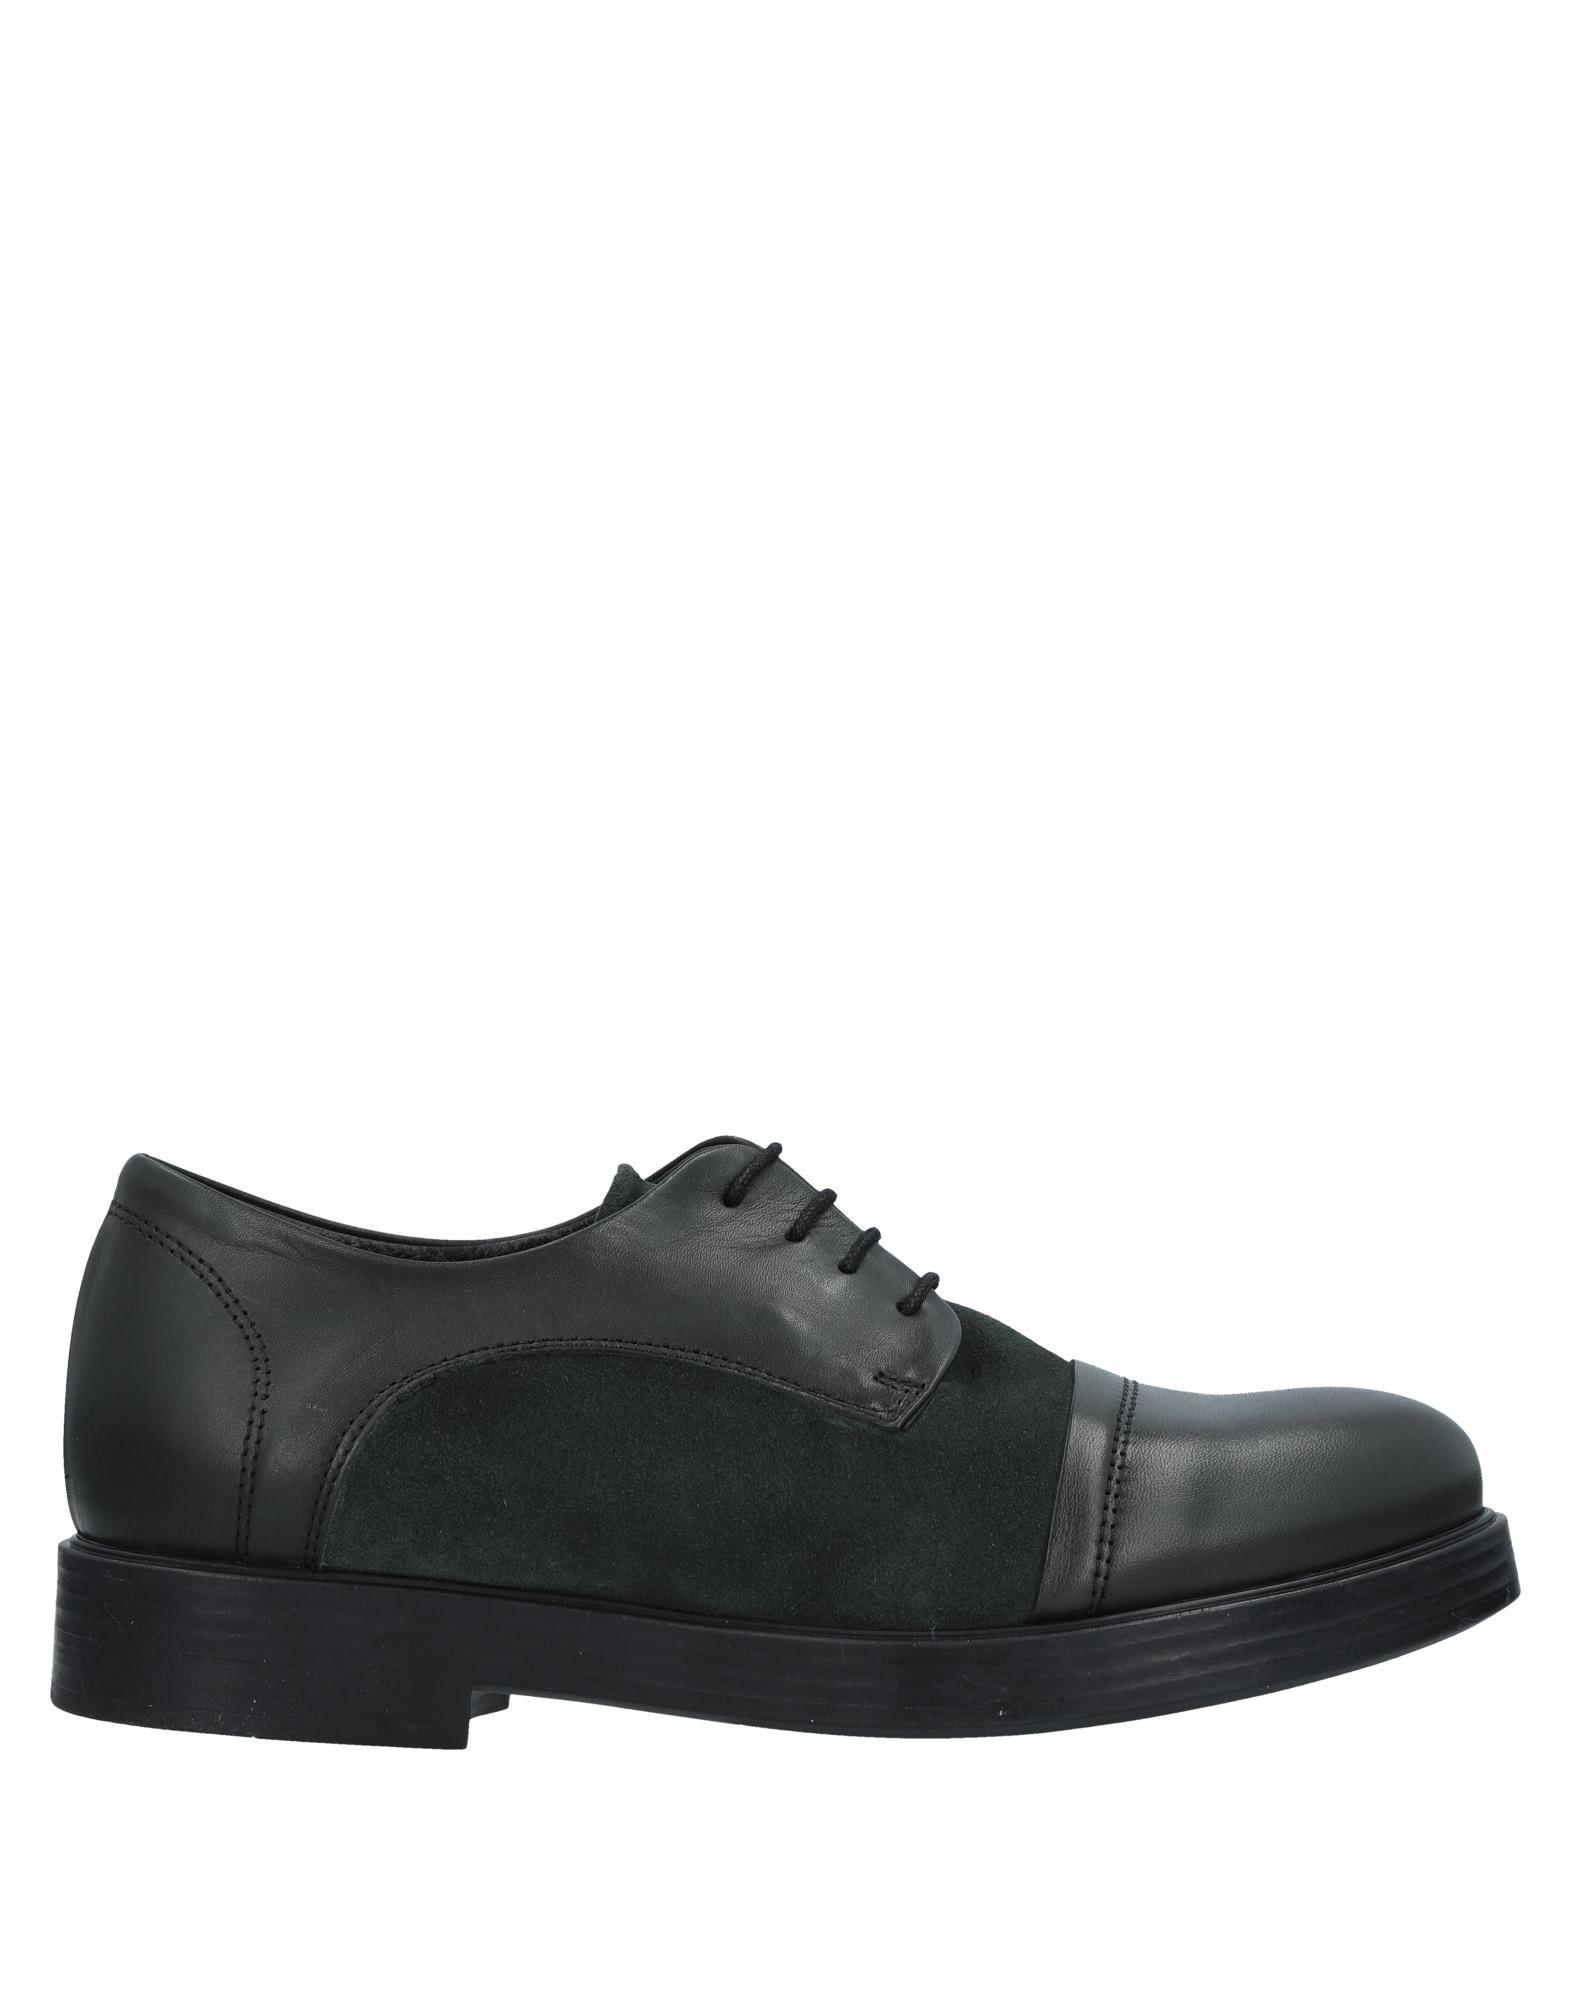 Lilimill Schnürschuhe Damen  11523962BH Gute Qualität beliebte Schuhe